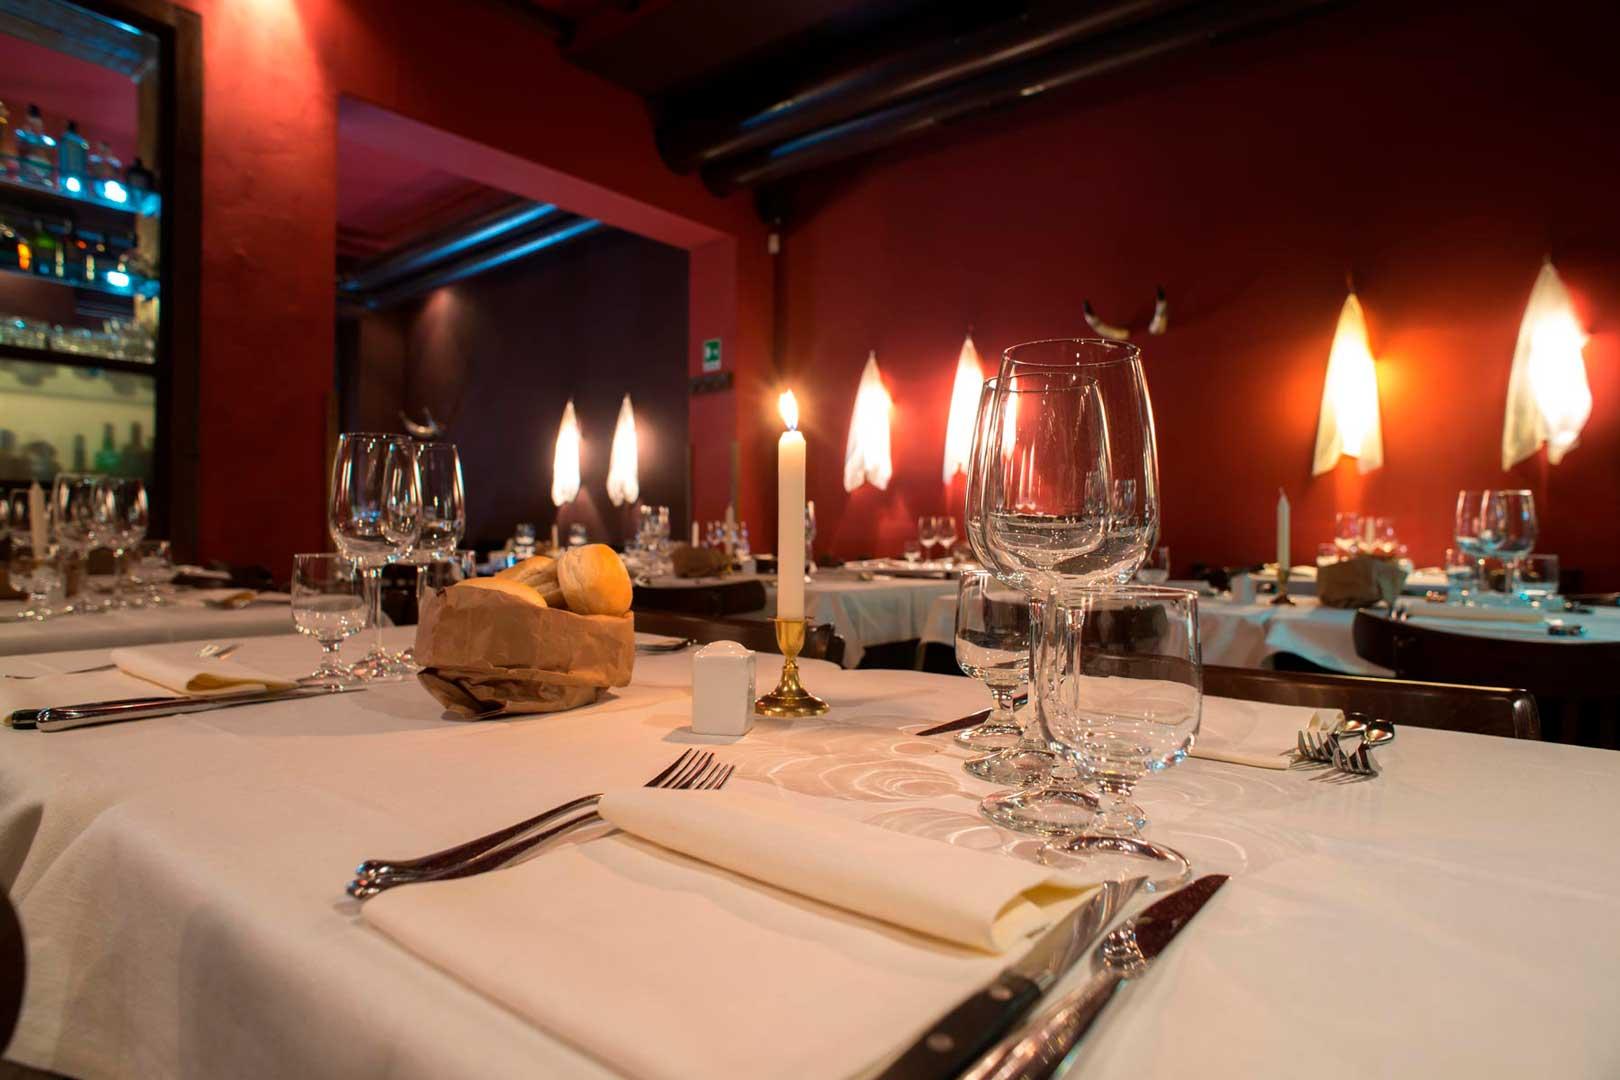 I 10 migliori ristoranti di carne a Milano - El Gaucho